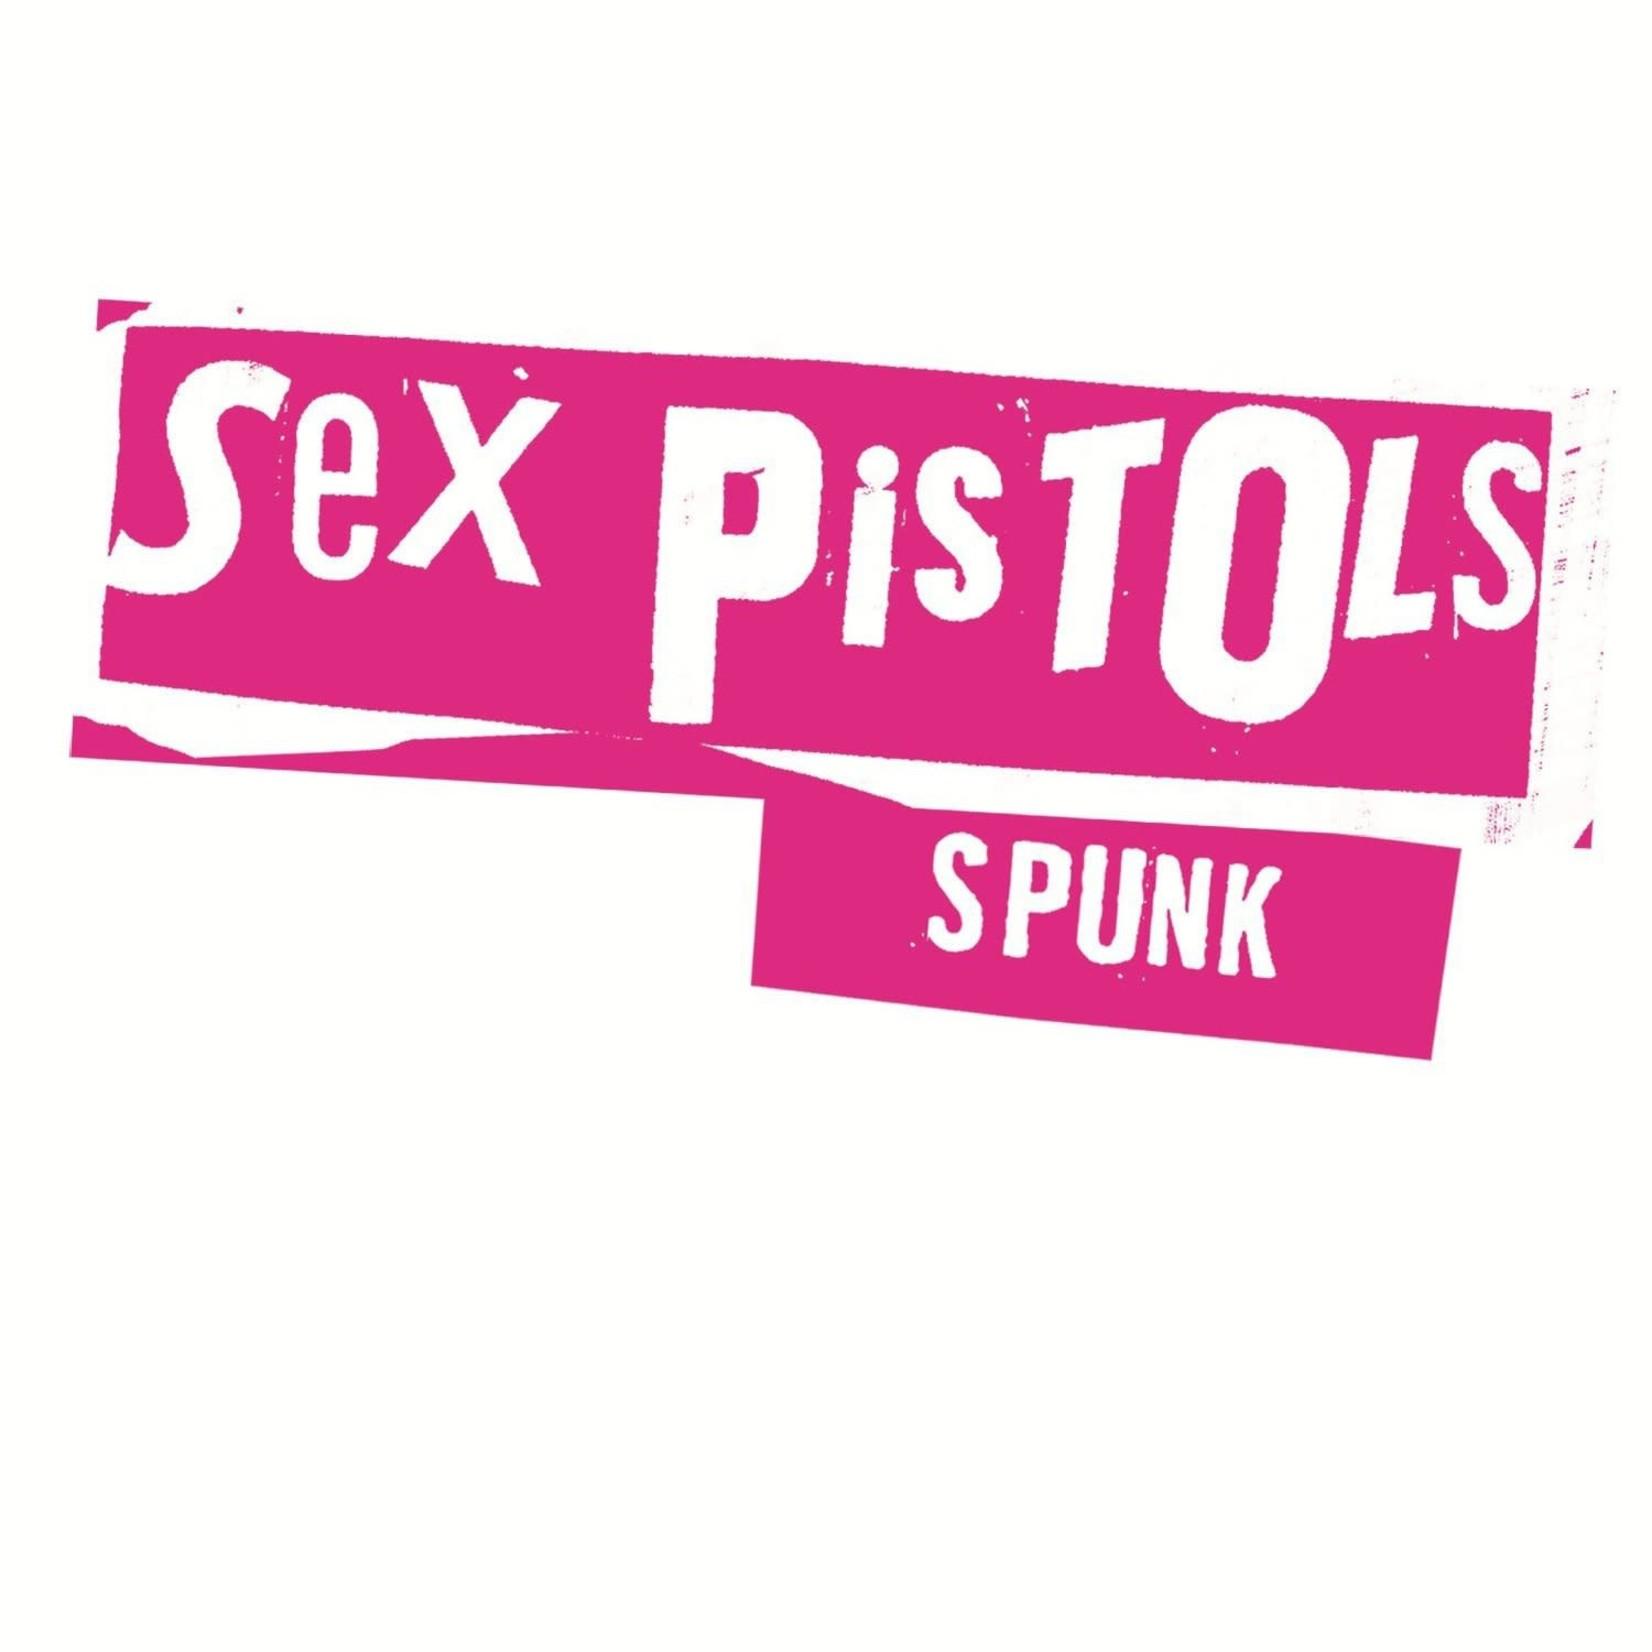 [New] Sex Pistols: Spunk